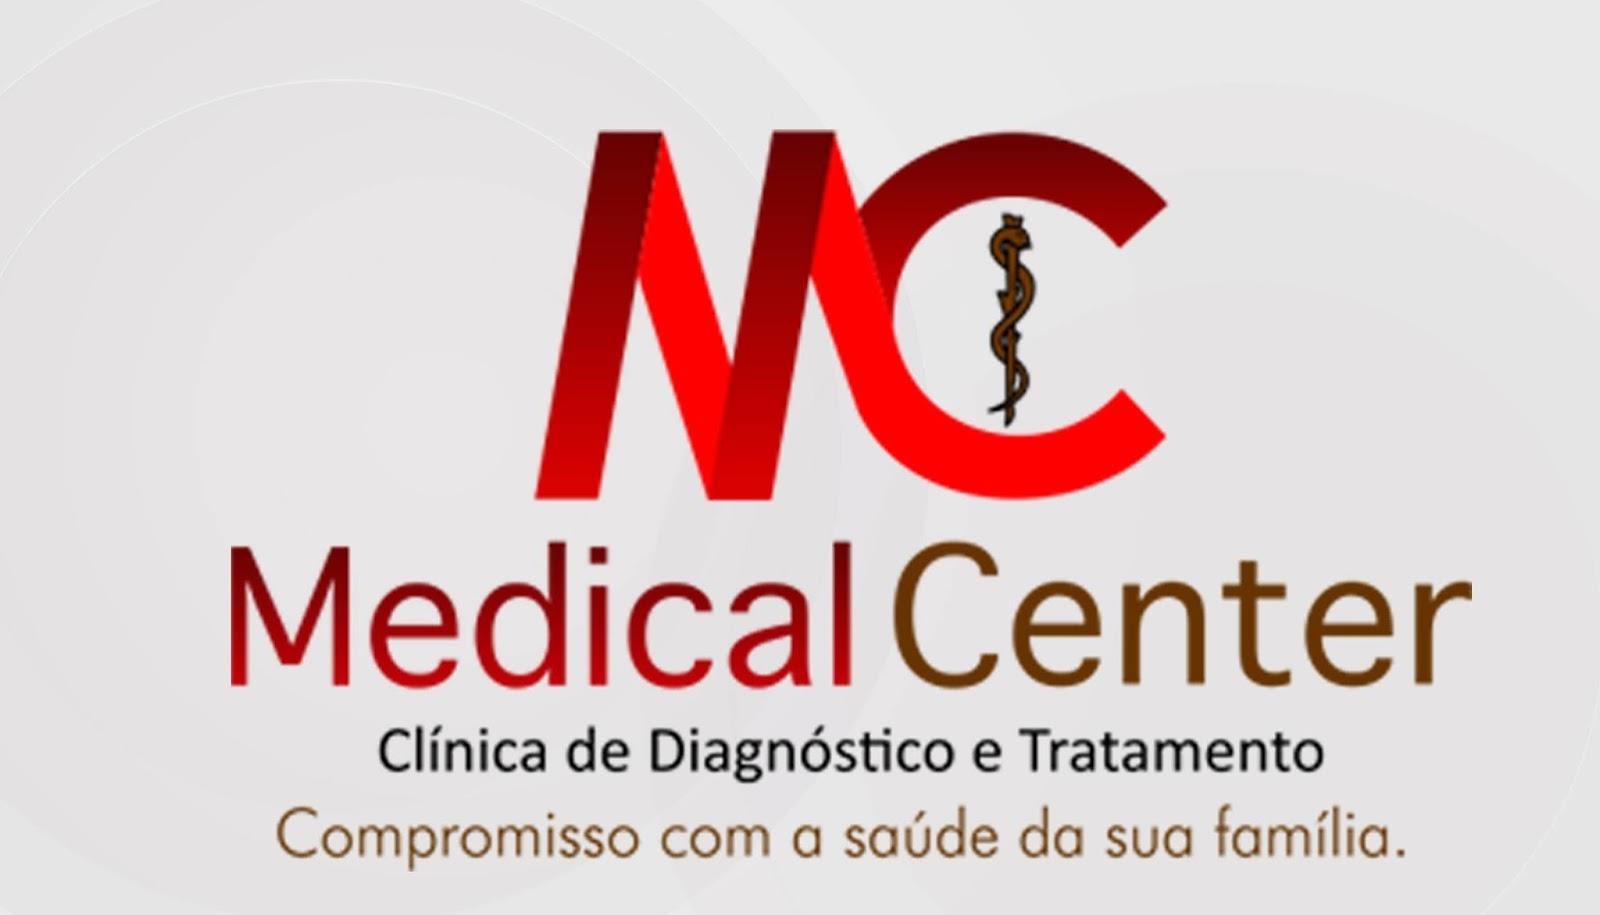 CLINICA MEDICAL CENTER